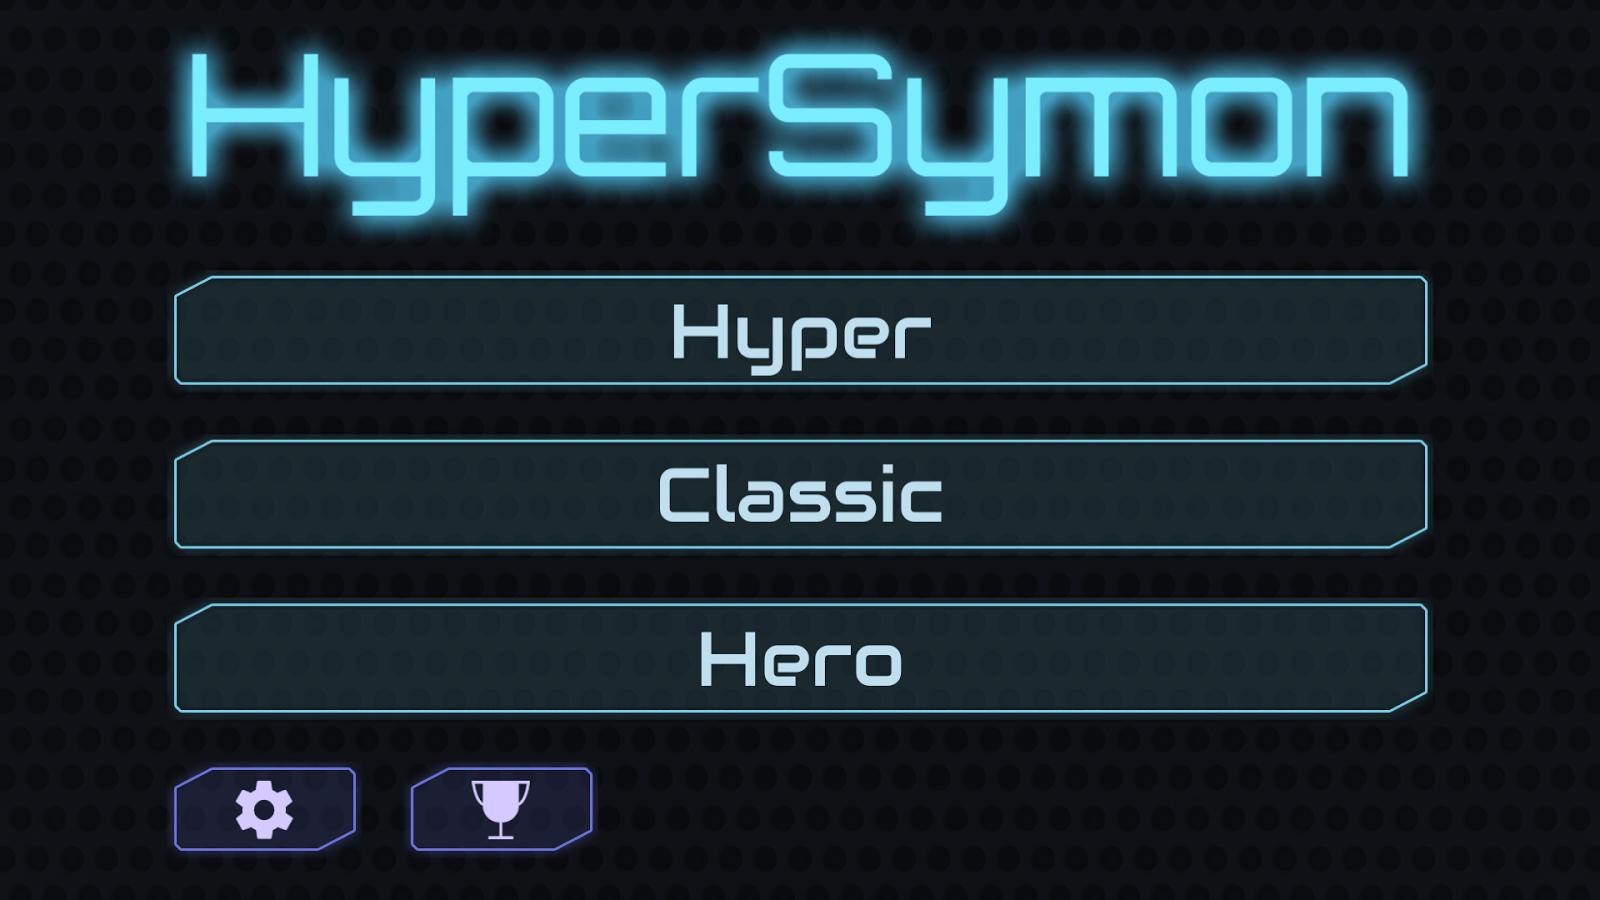 HyperSymon